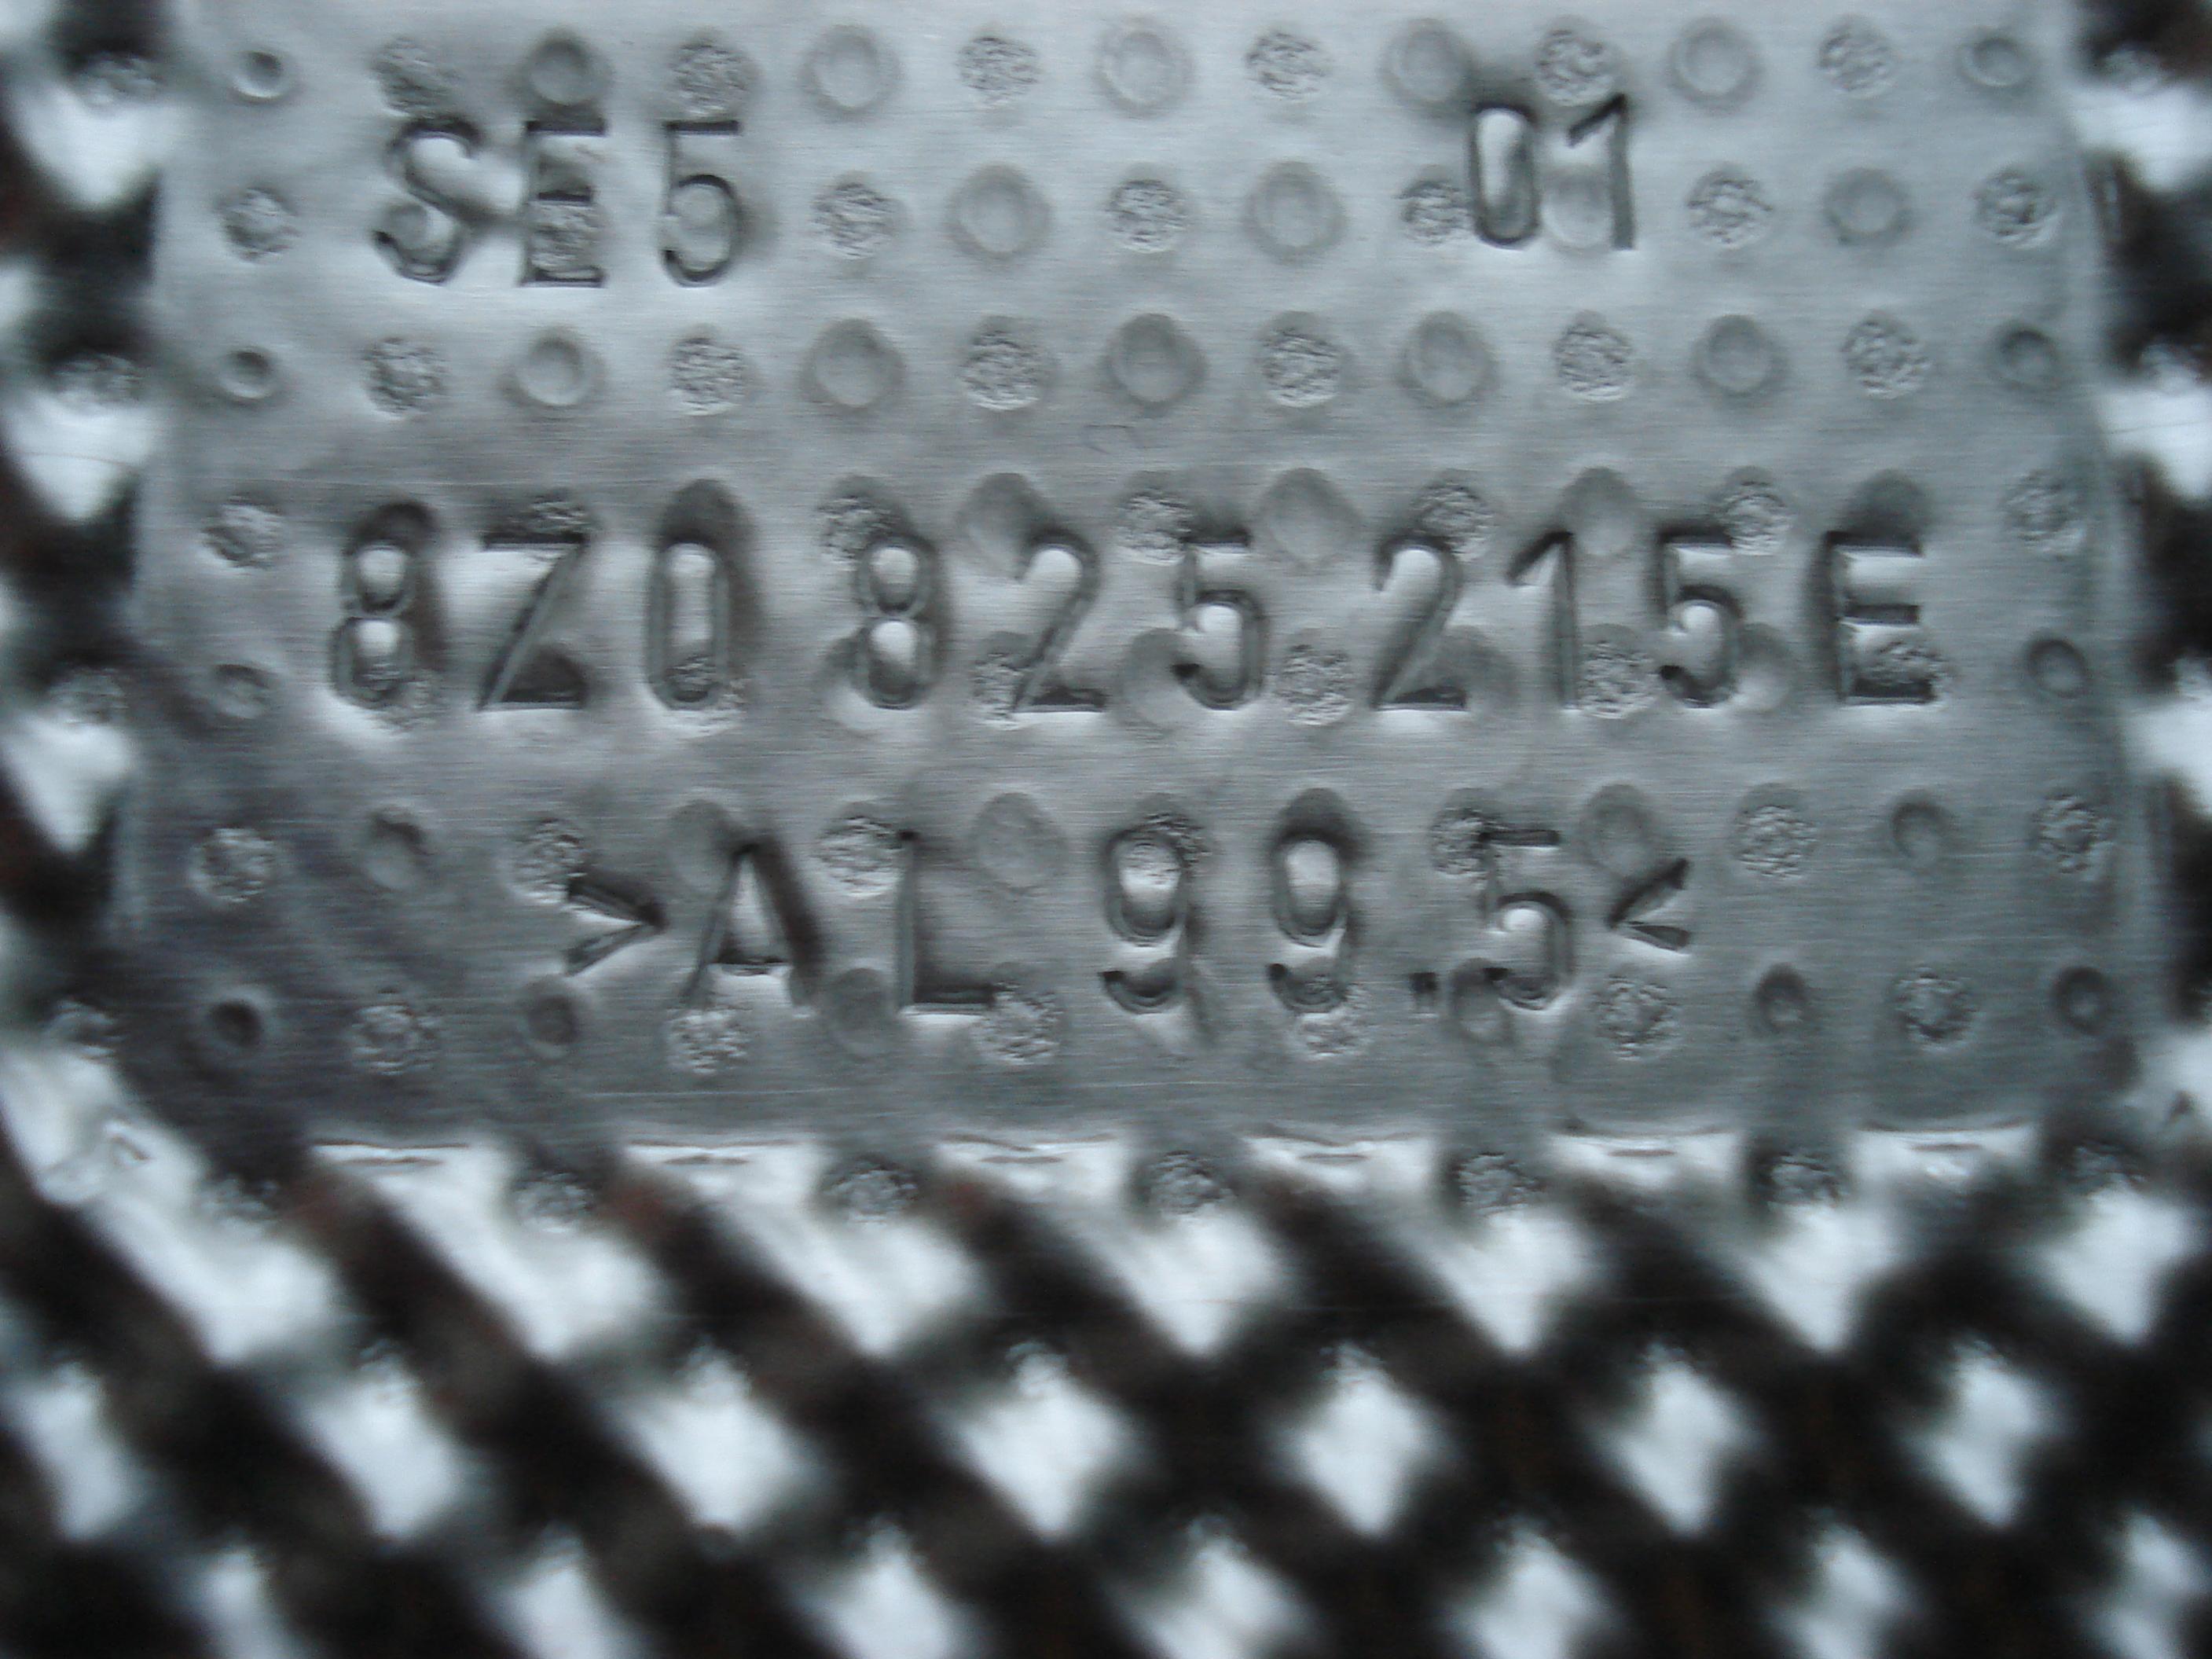 DSC03268.jpg.6a907061d840c7e068cac83690240cb8.jpg